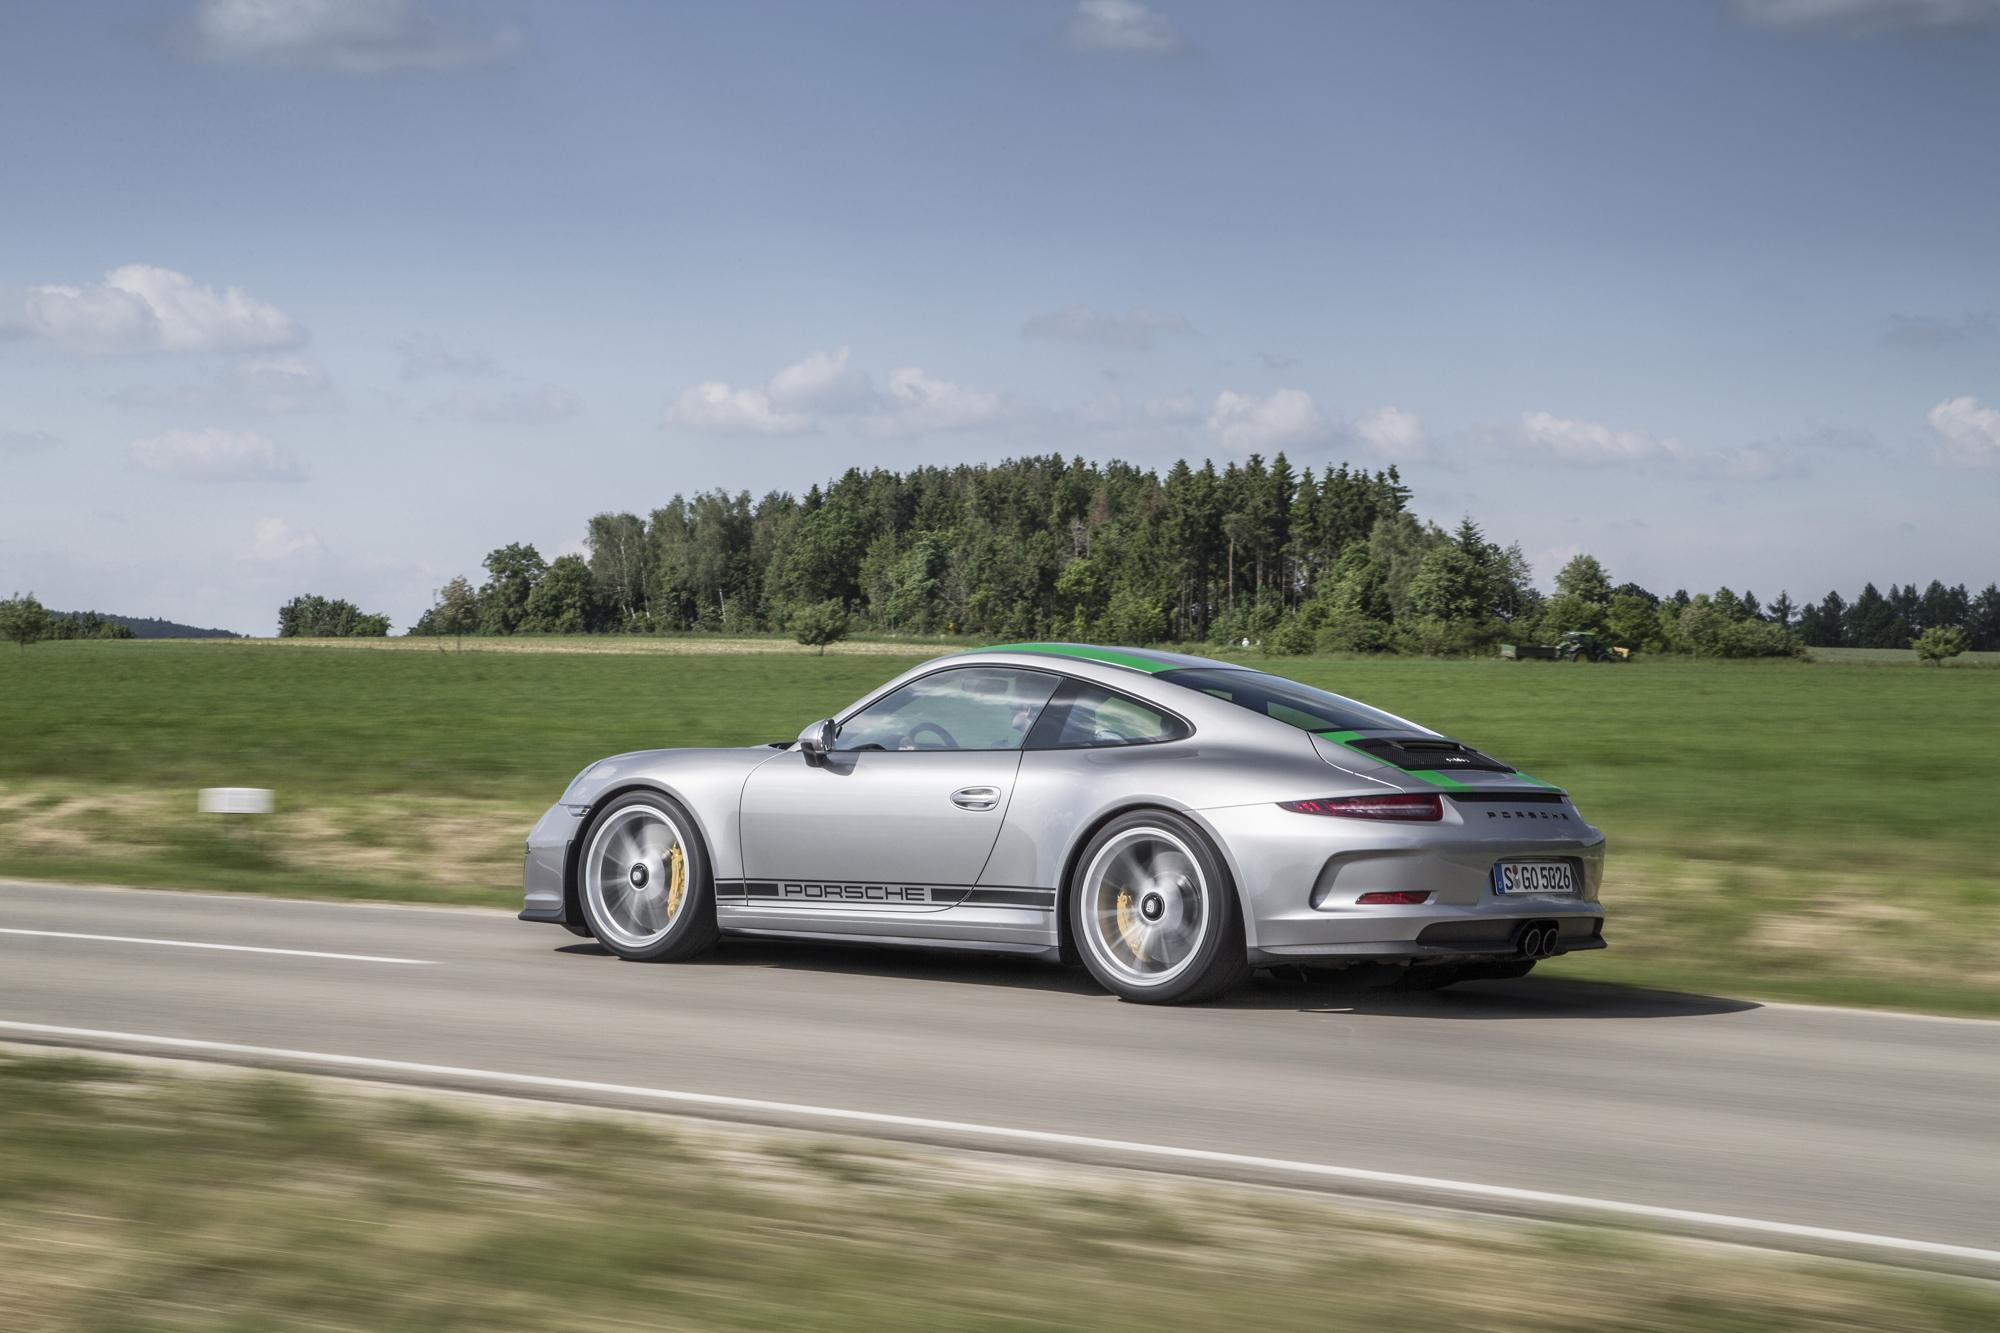 Porsche 911 R side Flat-Out